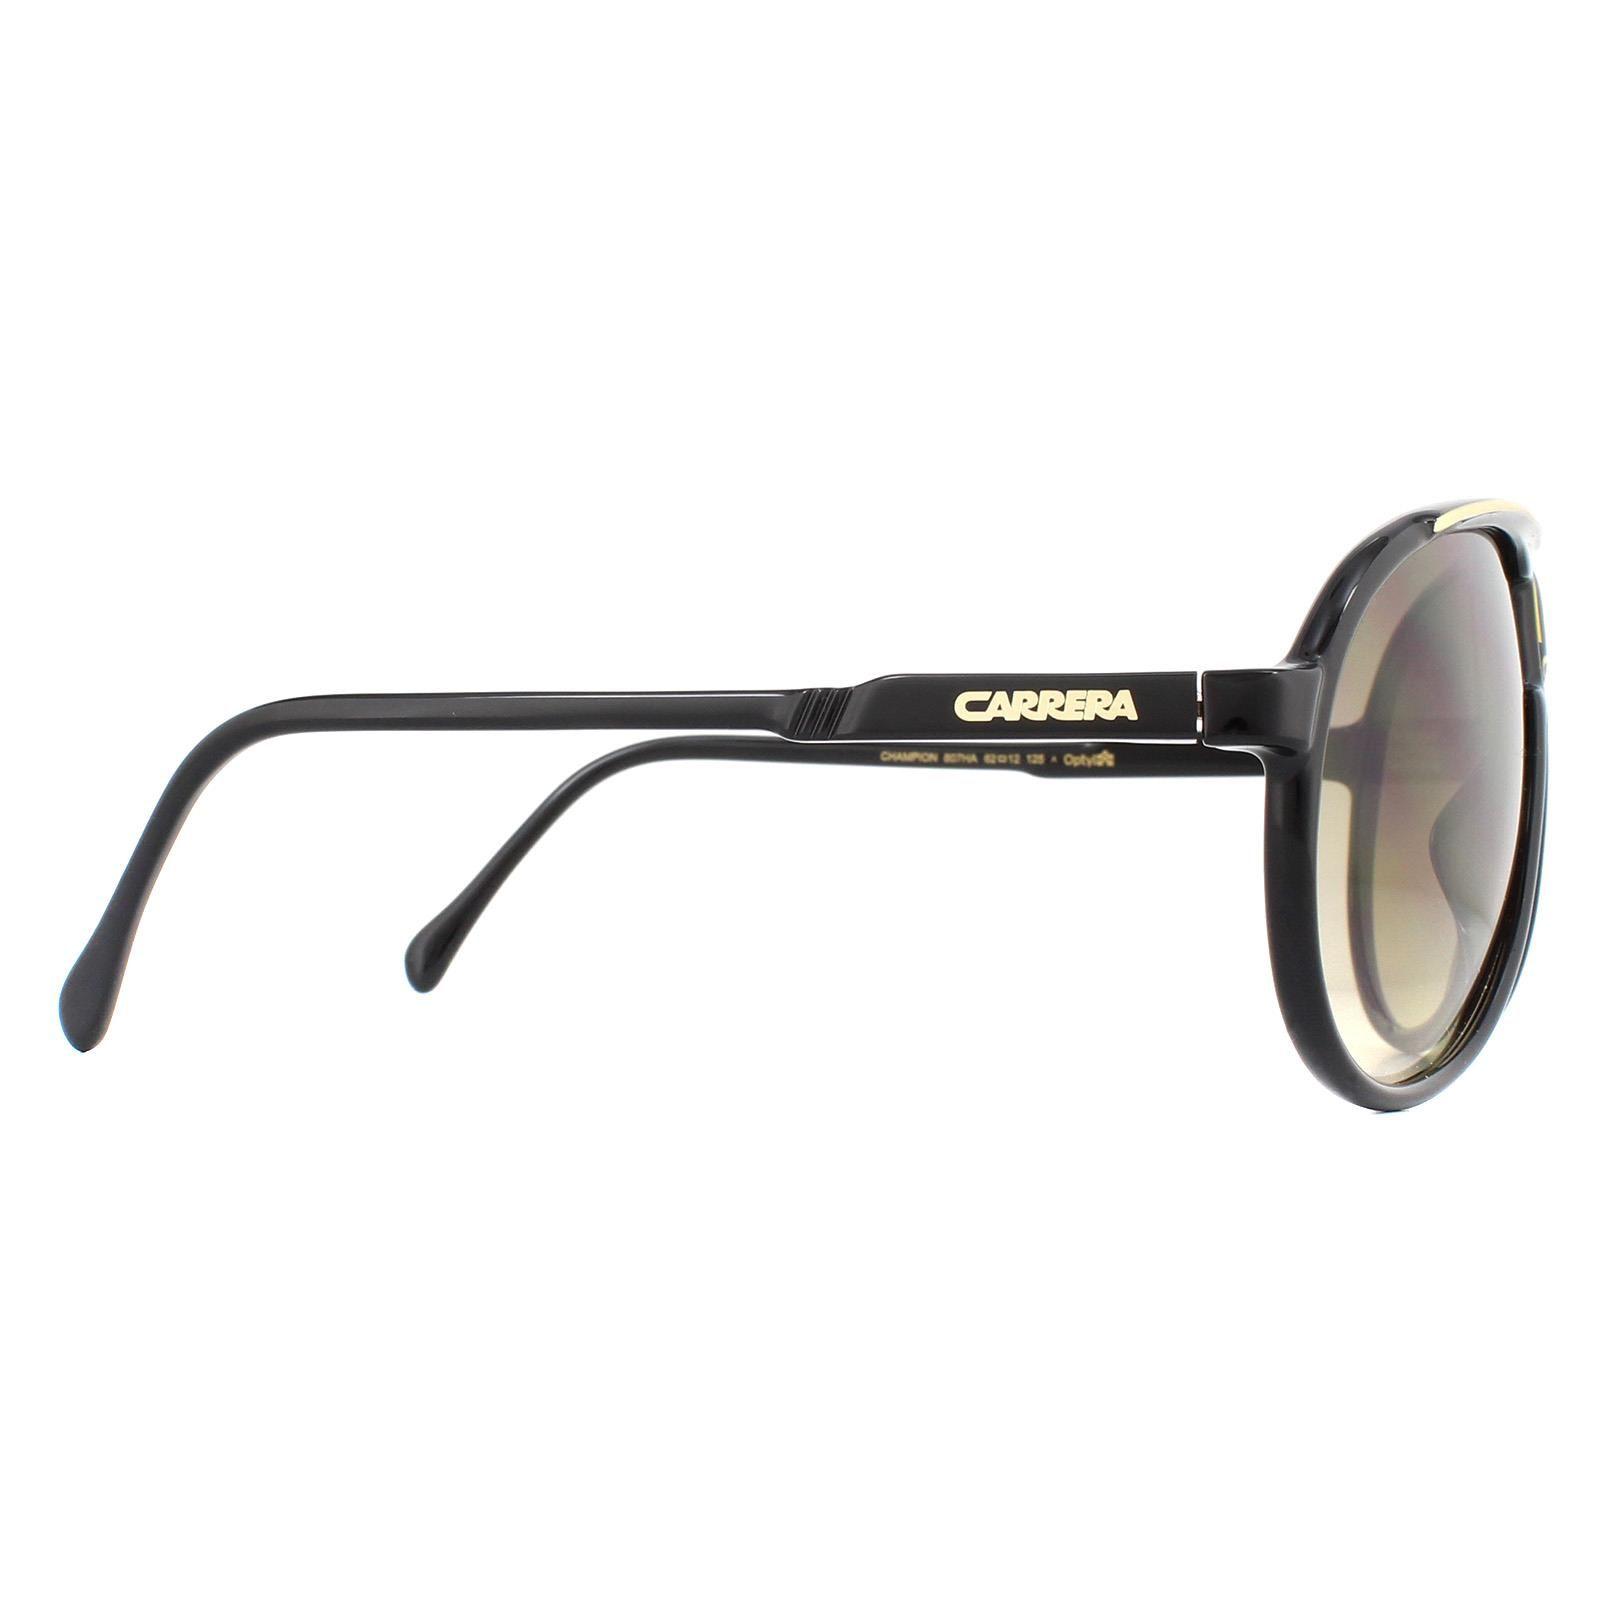 Carrera Sunglasses Carrera 1030/S 807 HA Black Brown Gradient